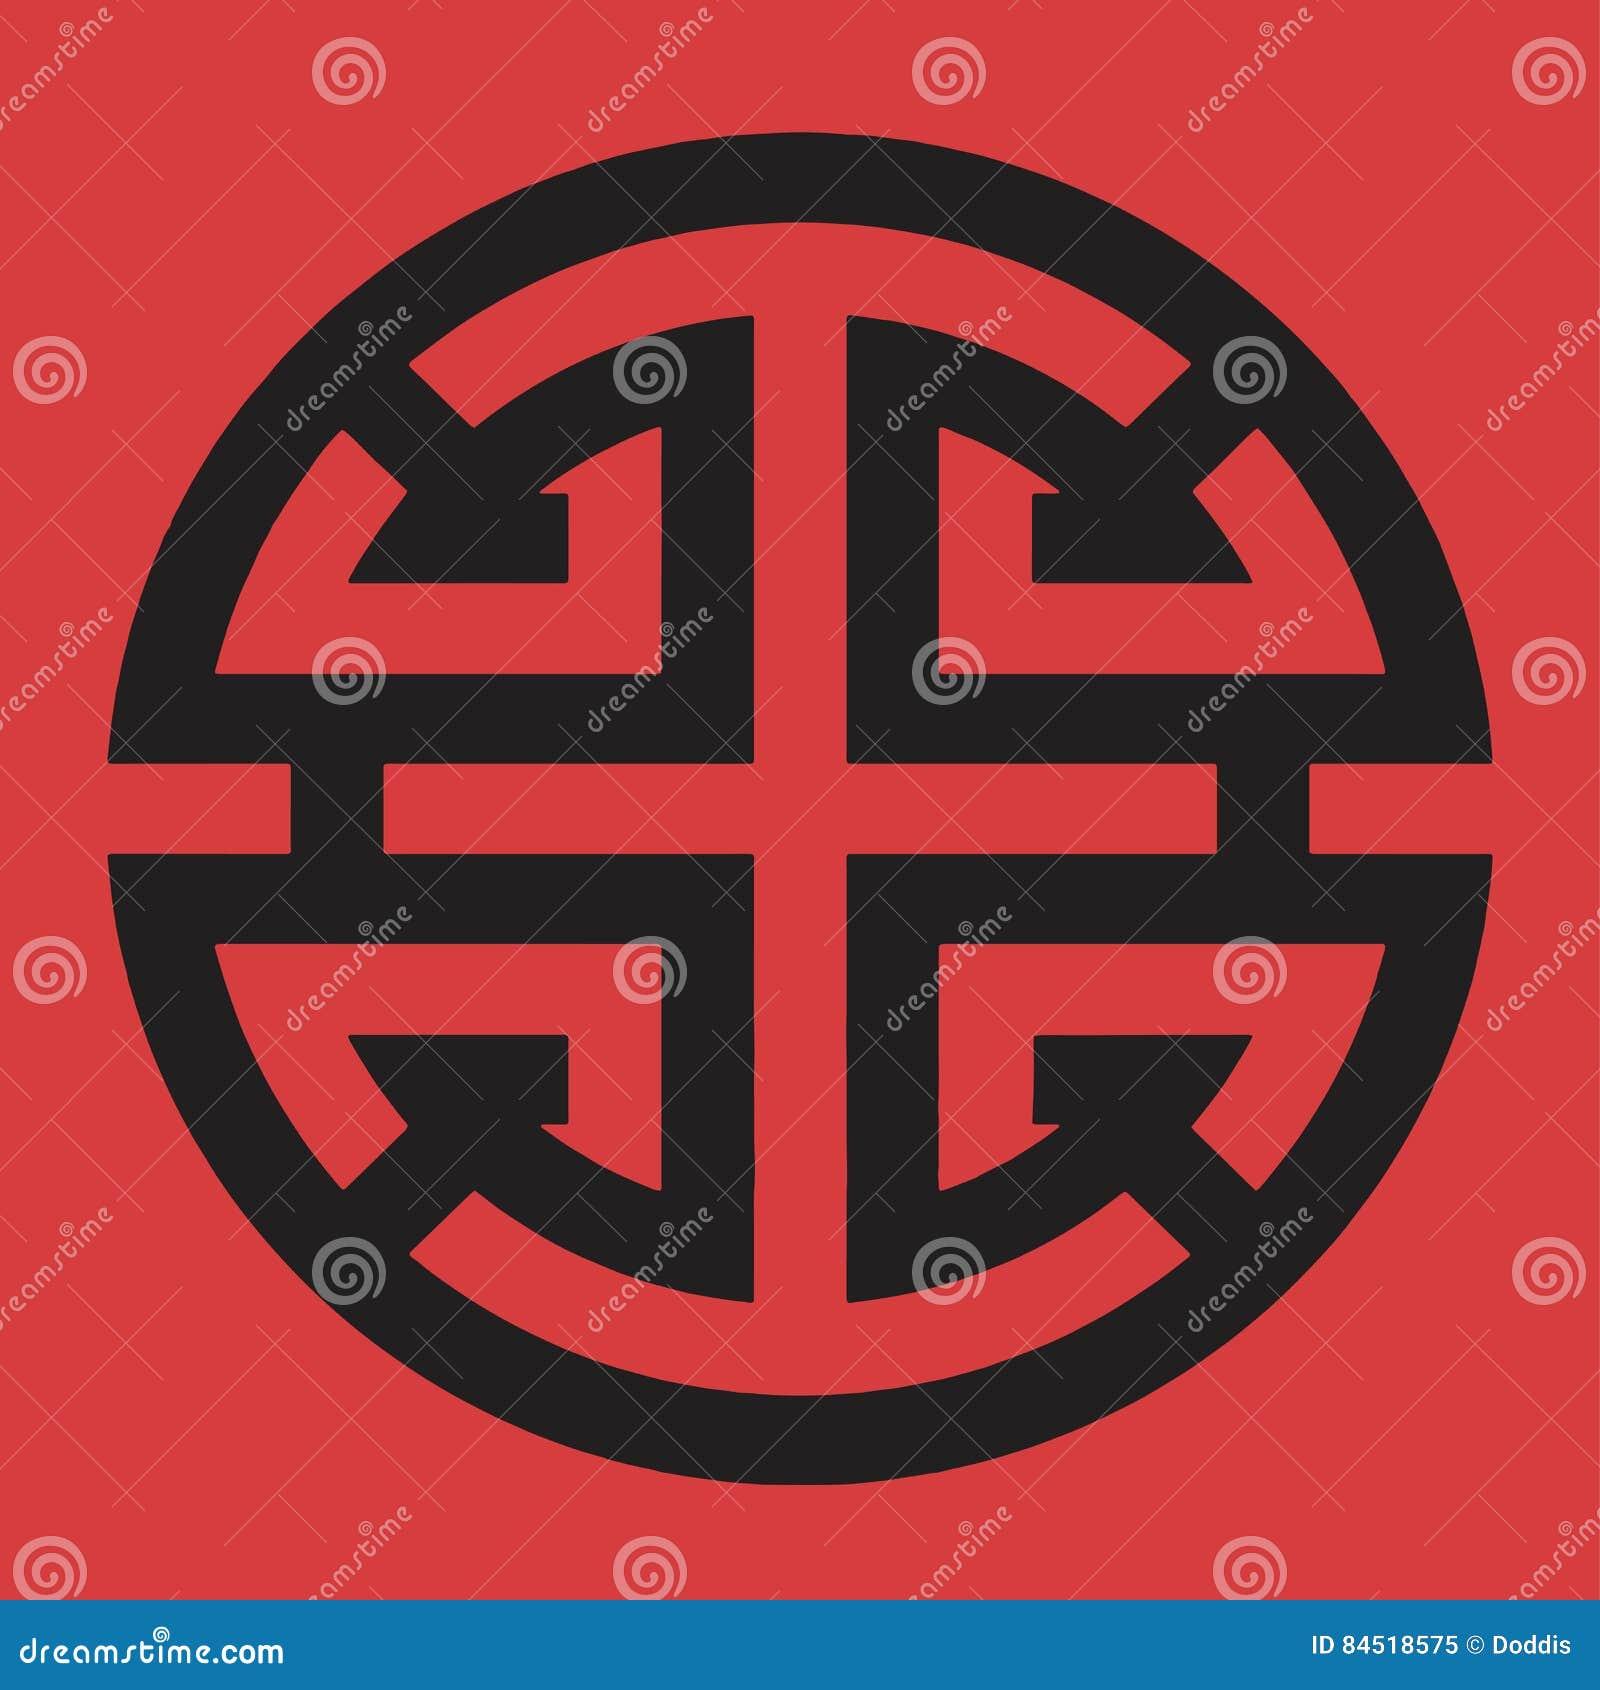 China Netflix Equivalent Stock Symbol